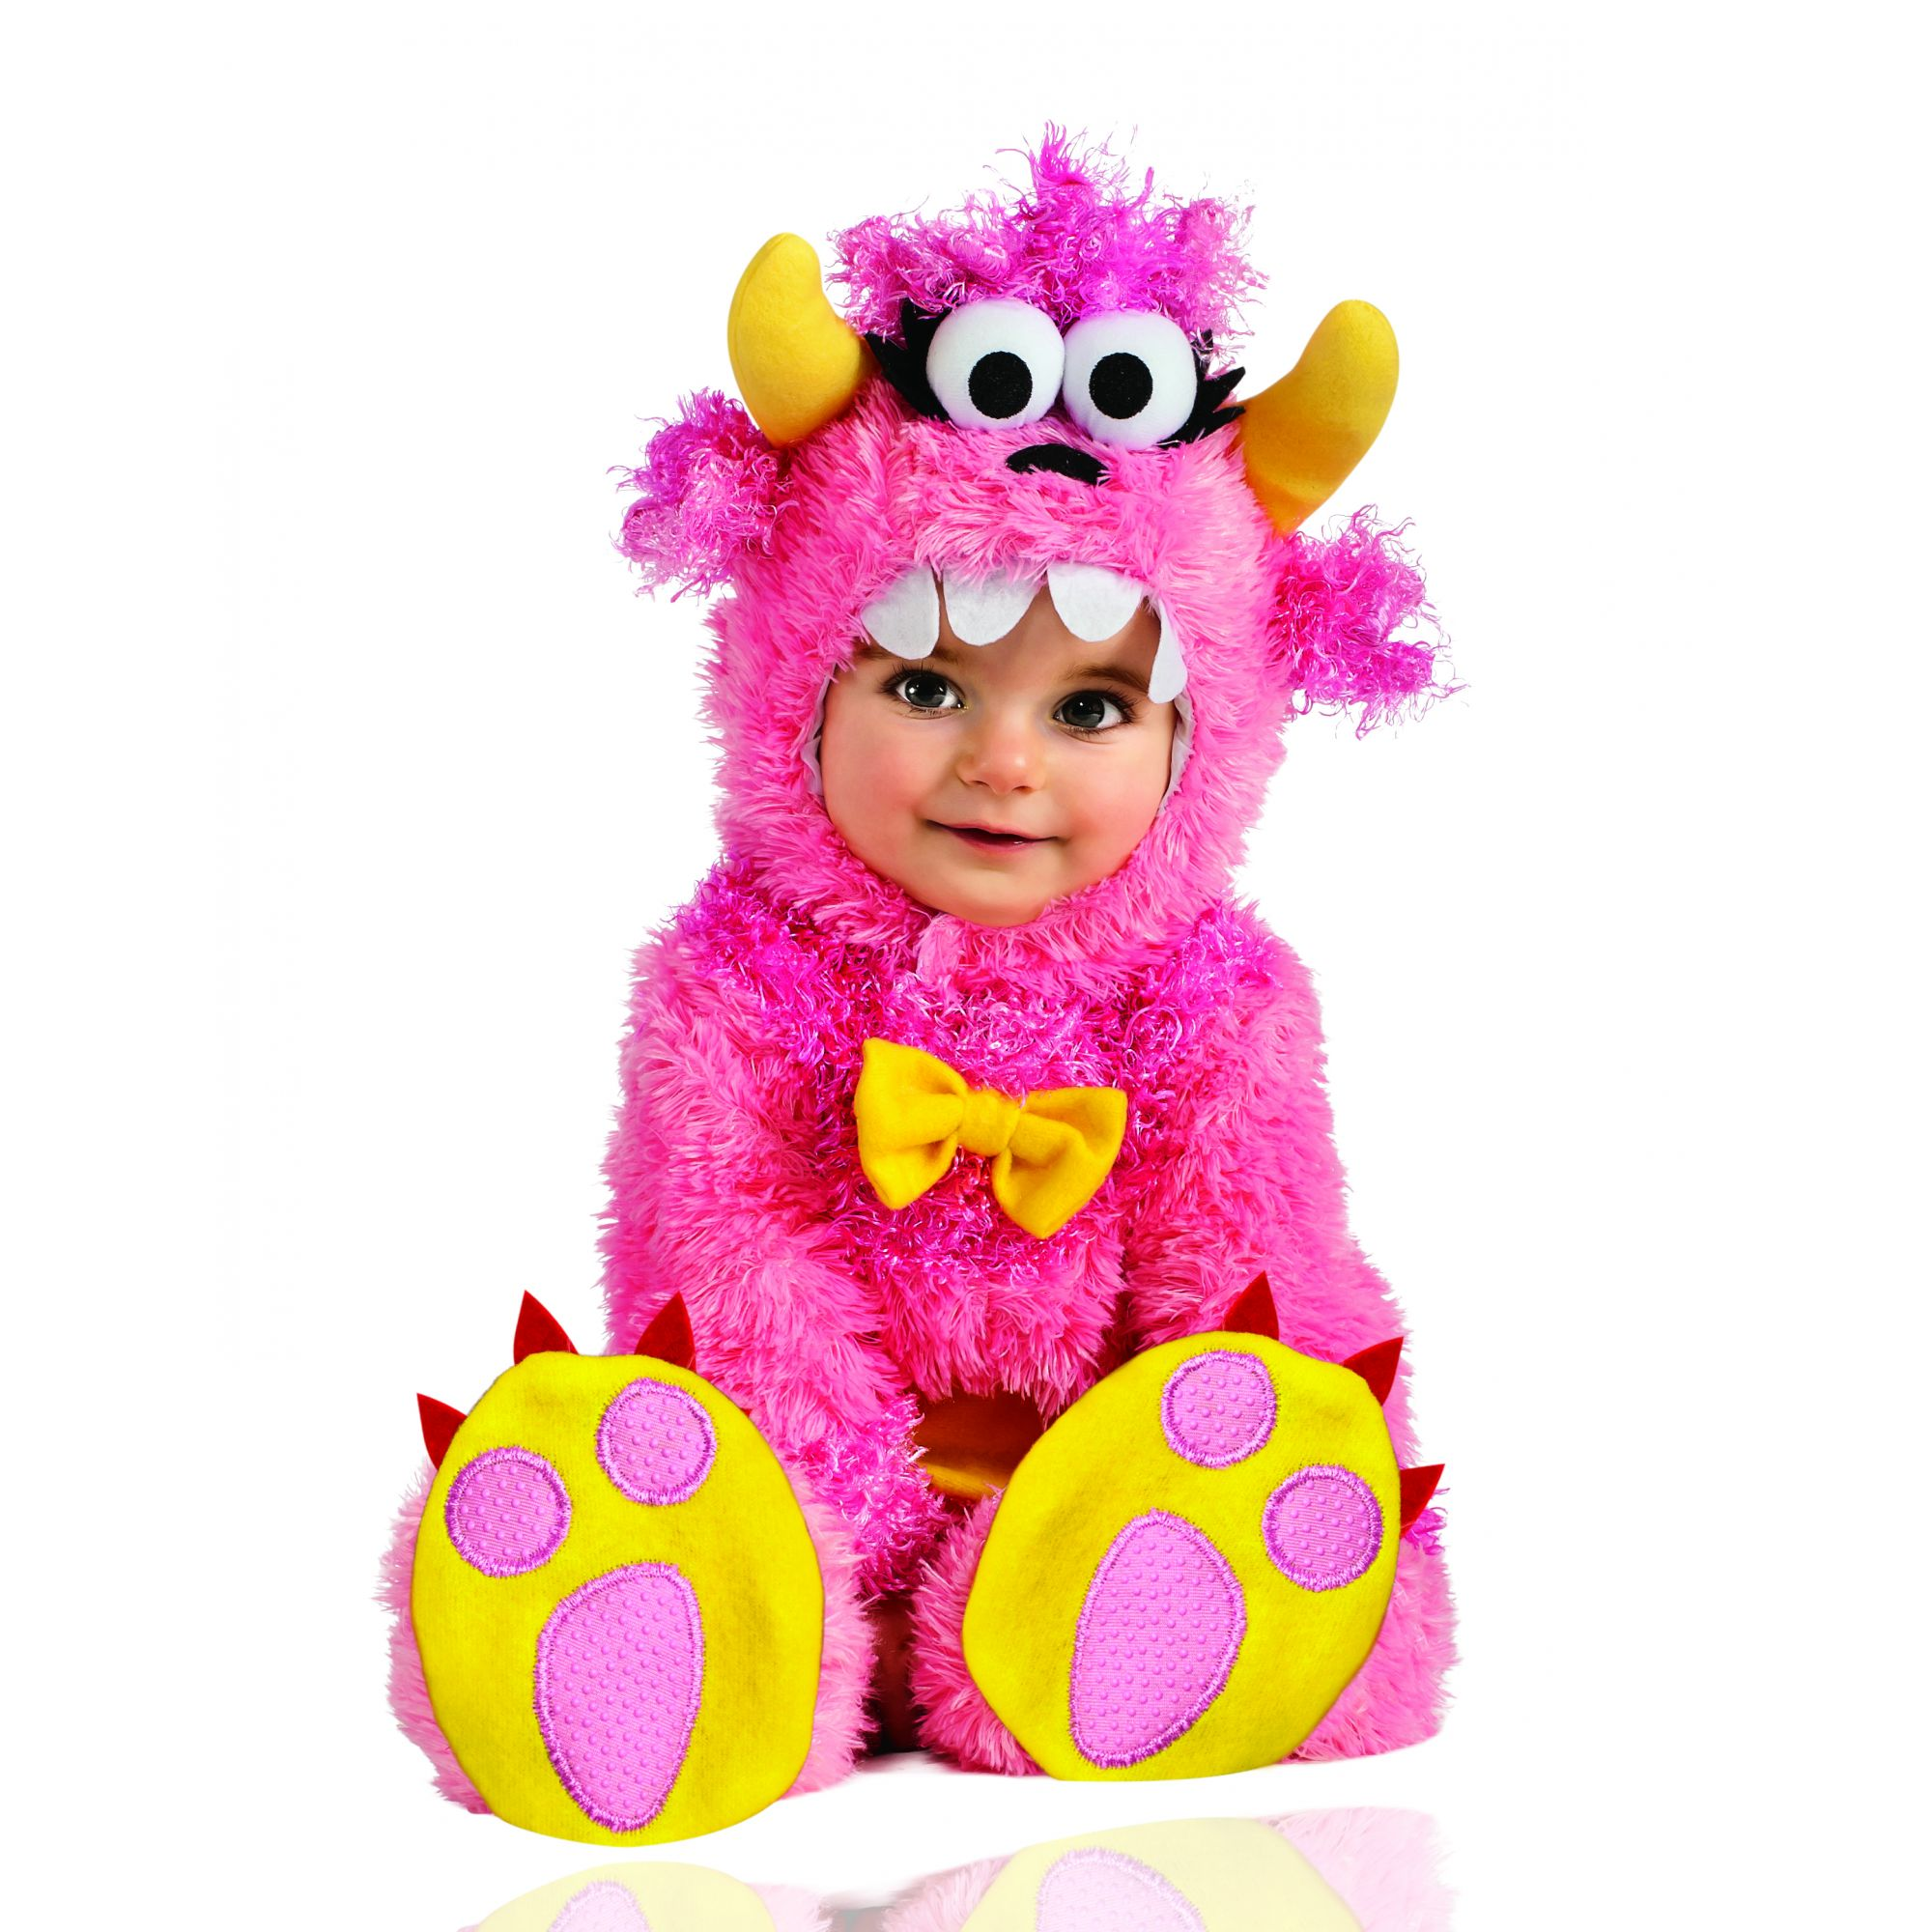 Costume pinky winky mostro simpatico bambina 12/18 mesi